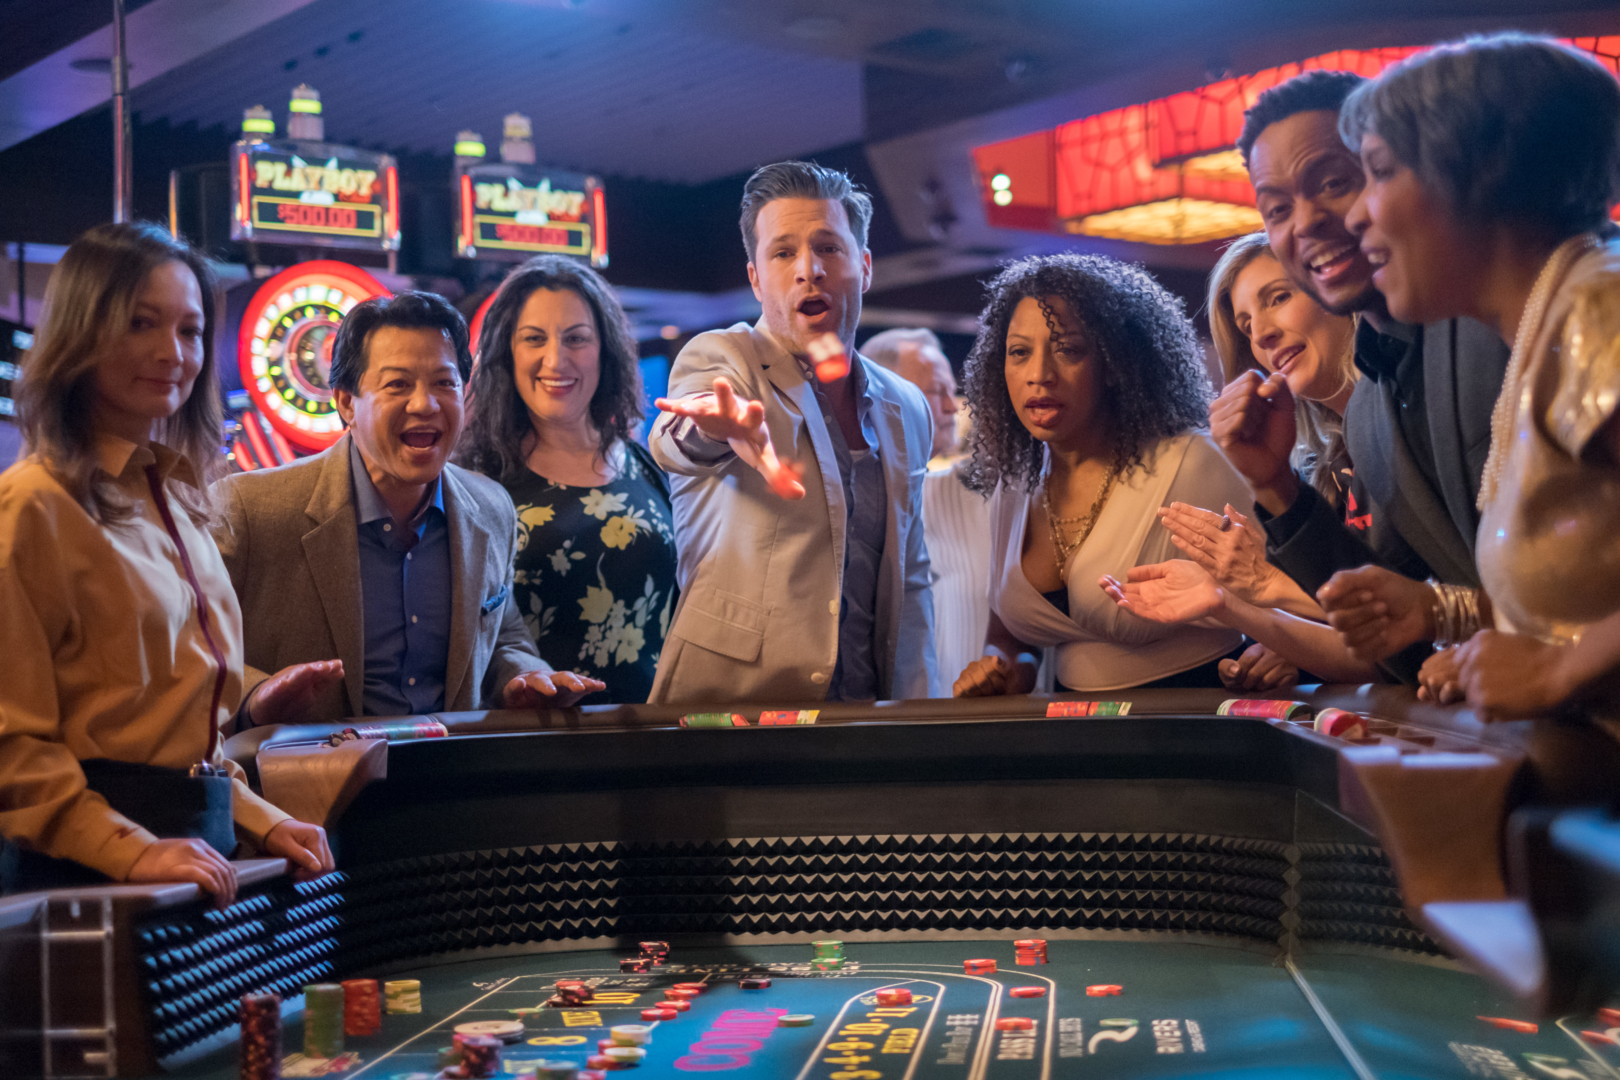 Casino Life Hacks